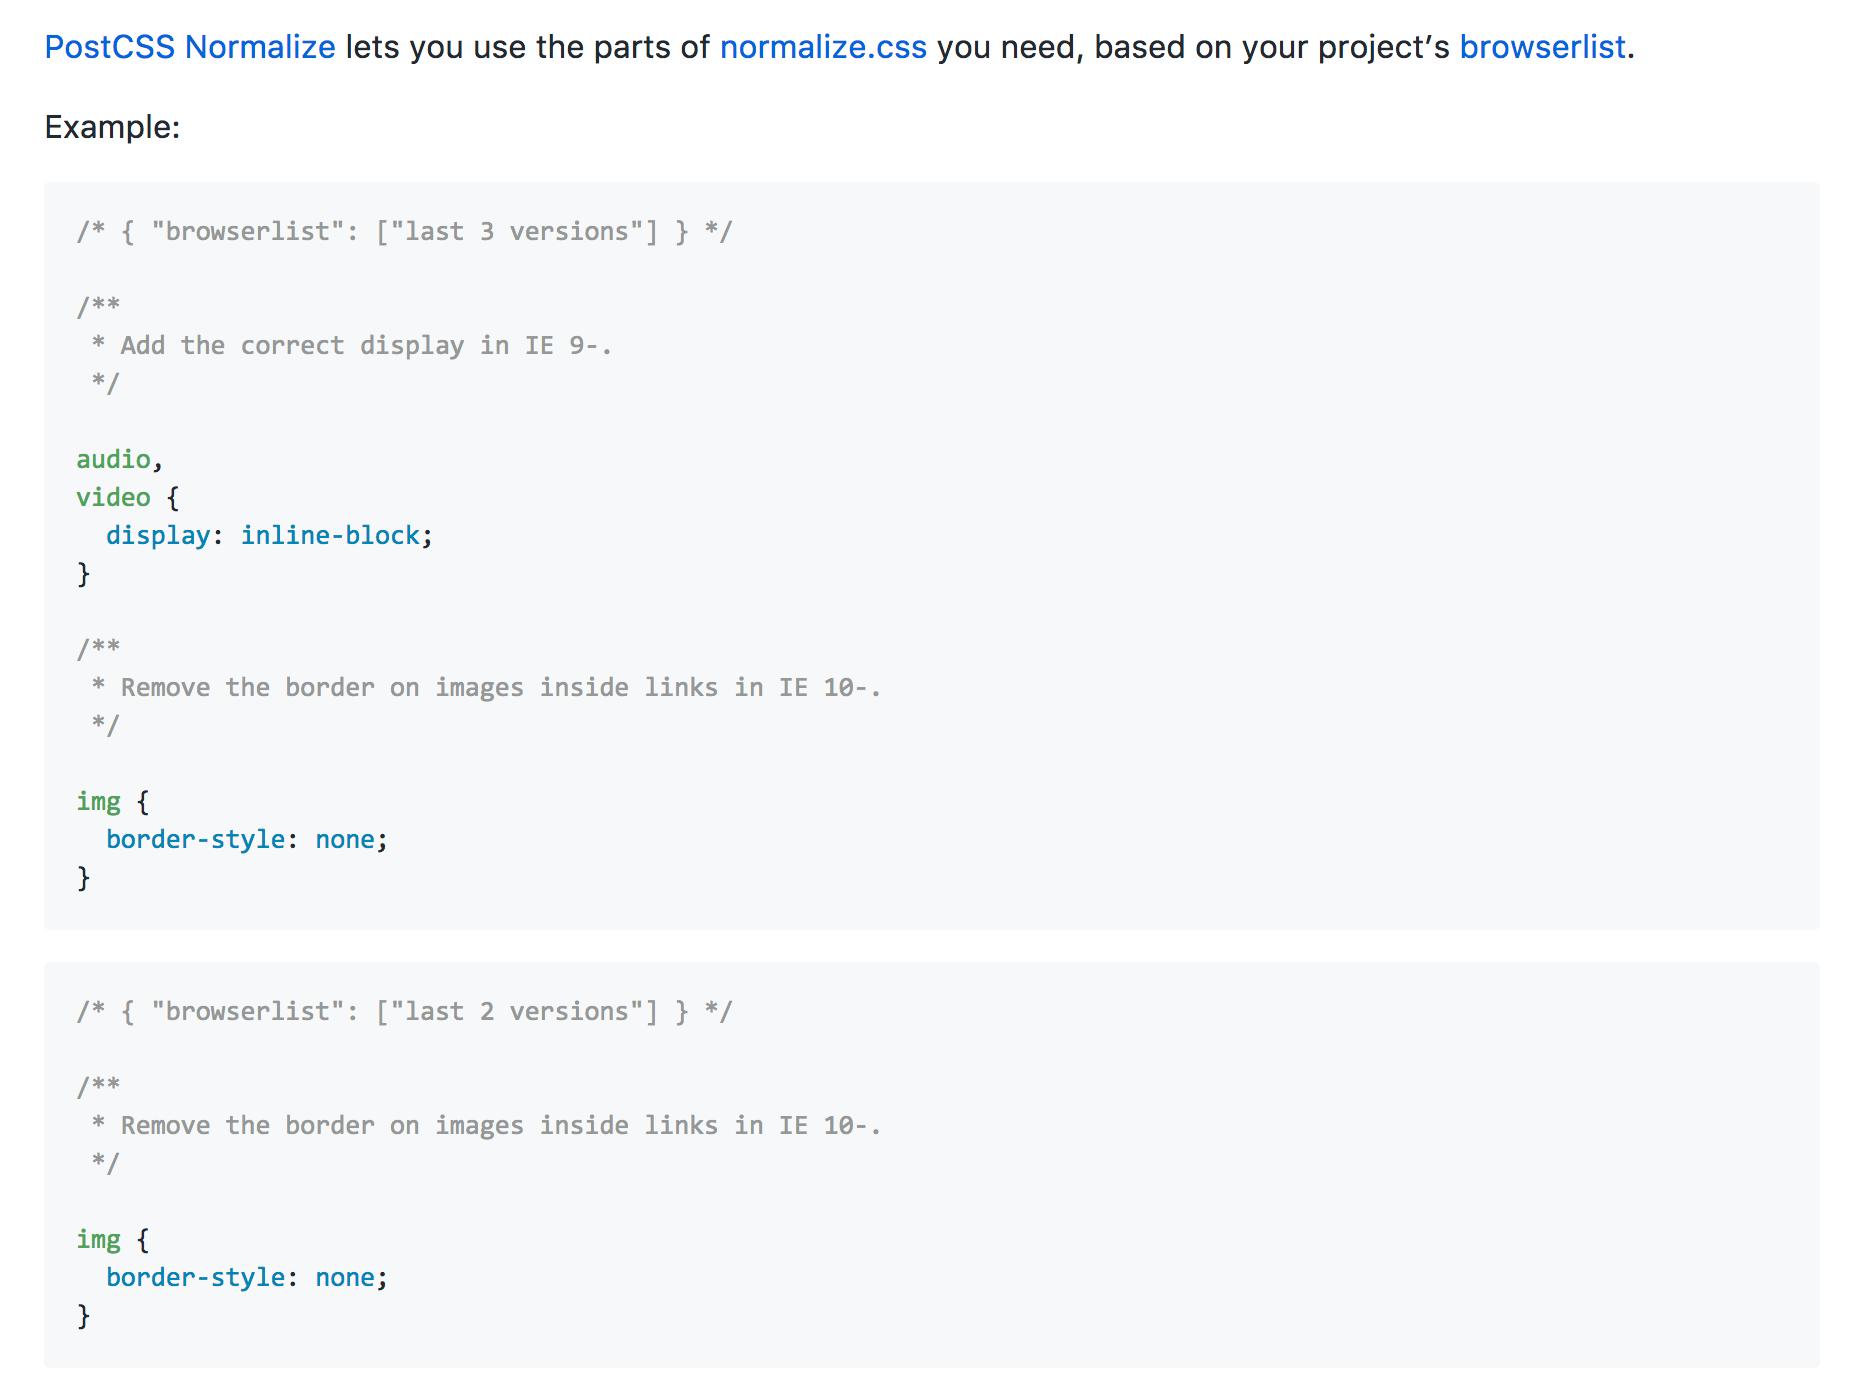 Browserslist is a Good Idea | CSS-Tricks